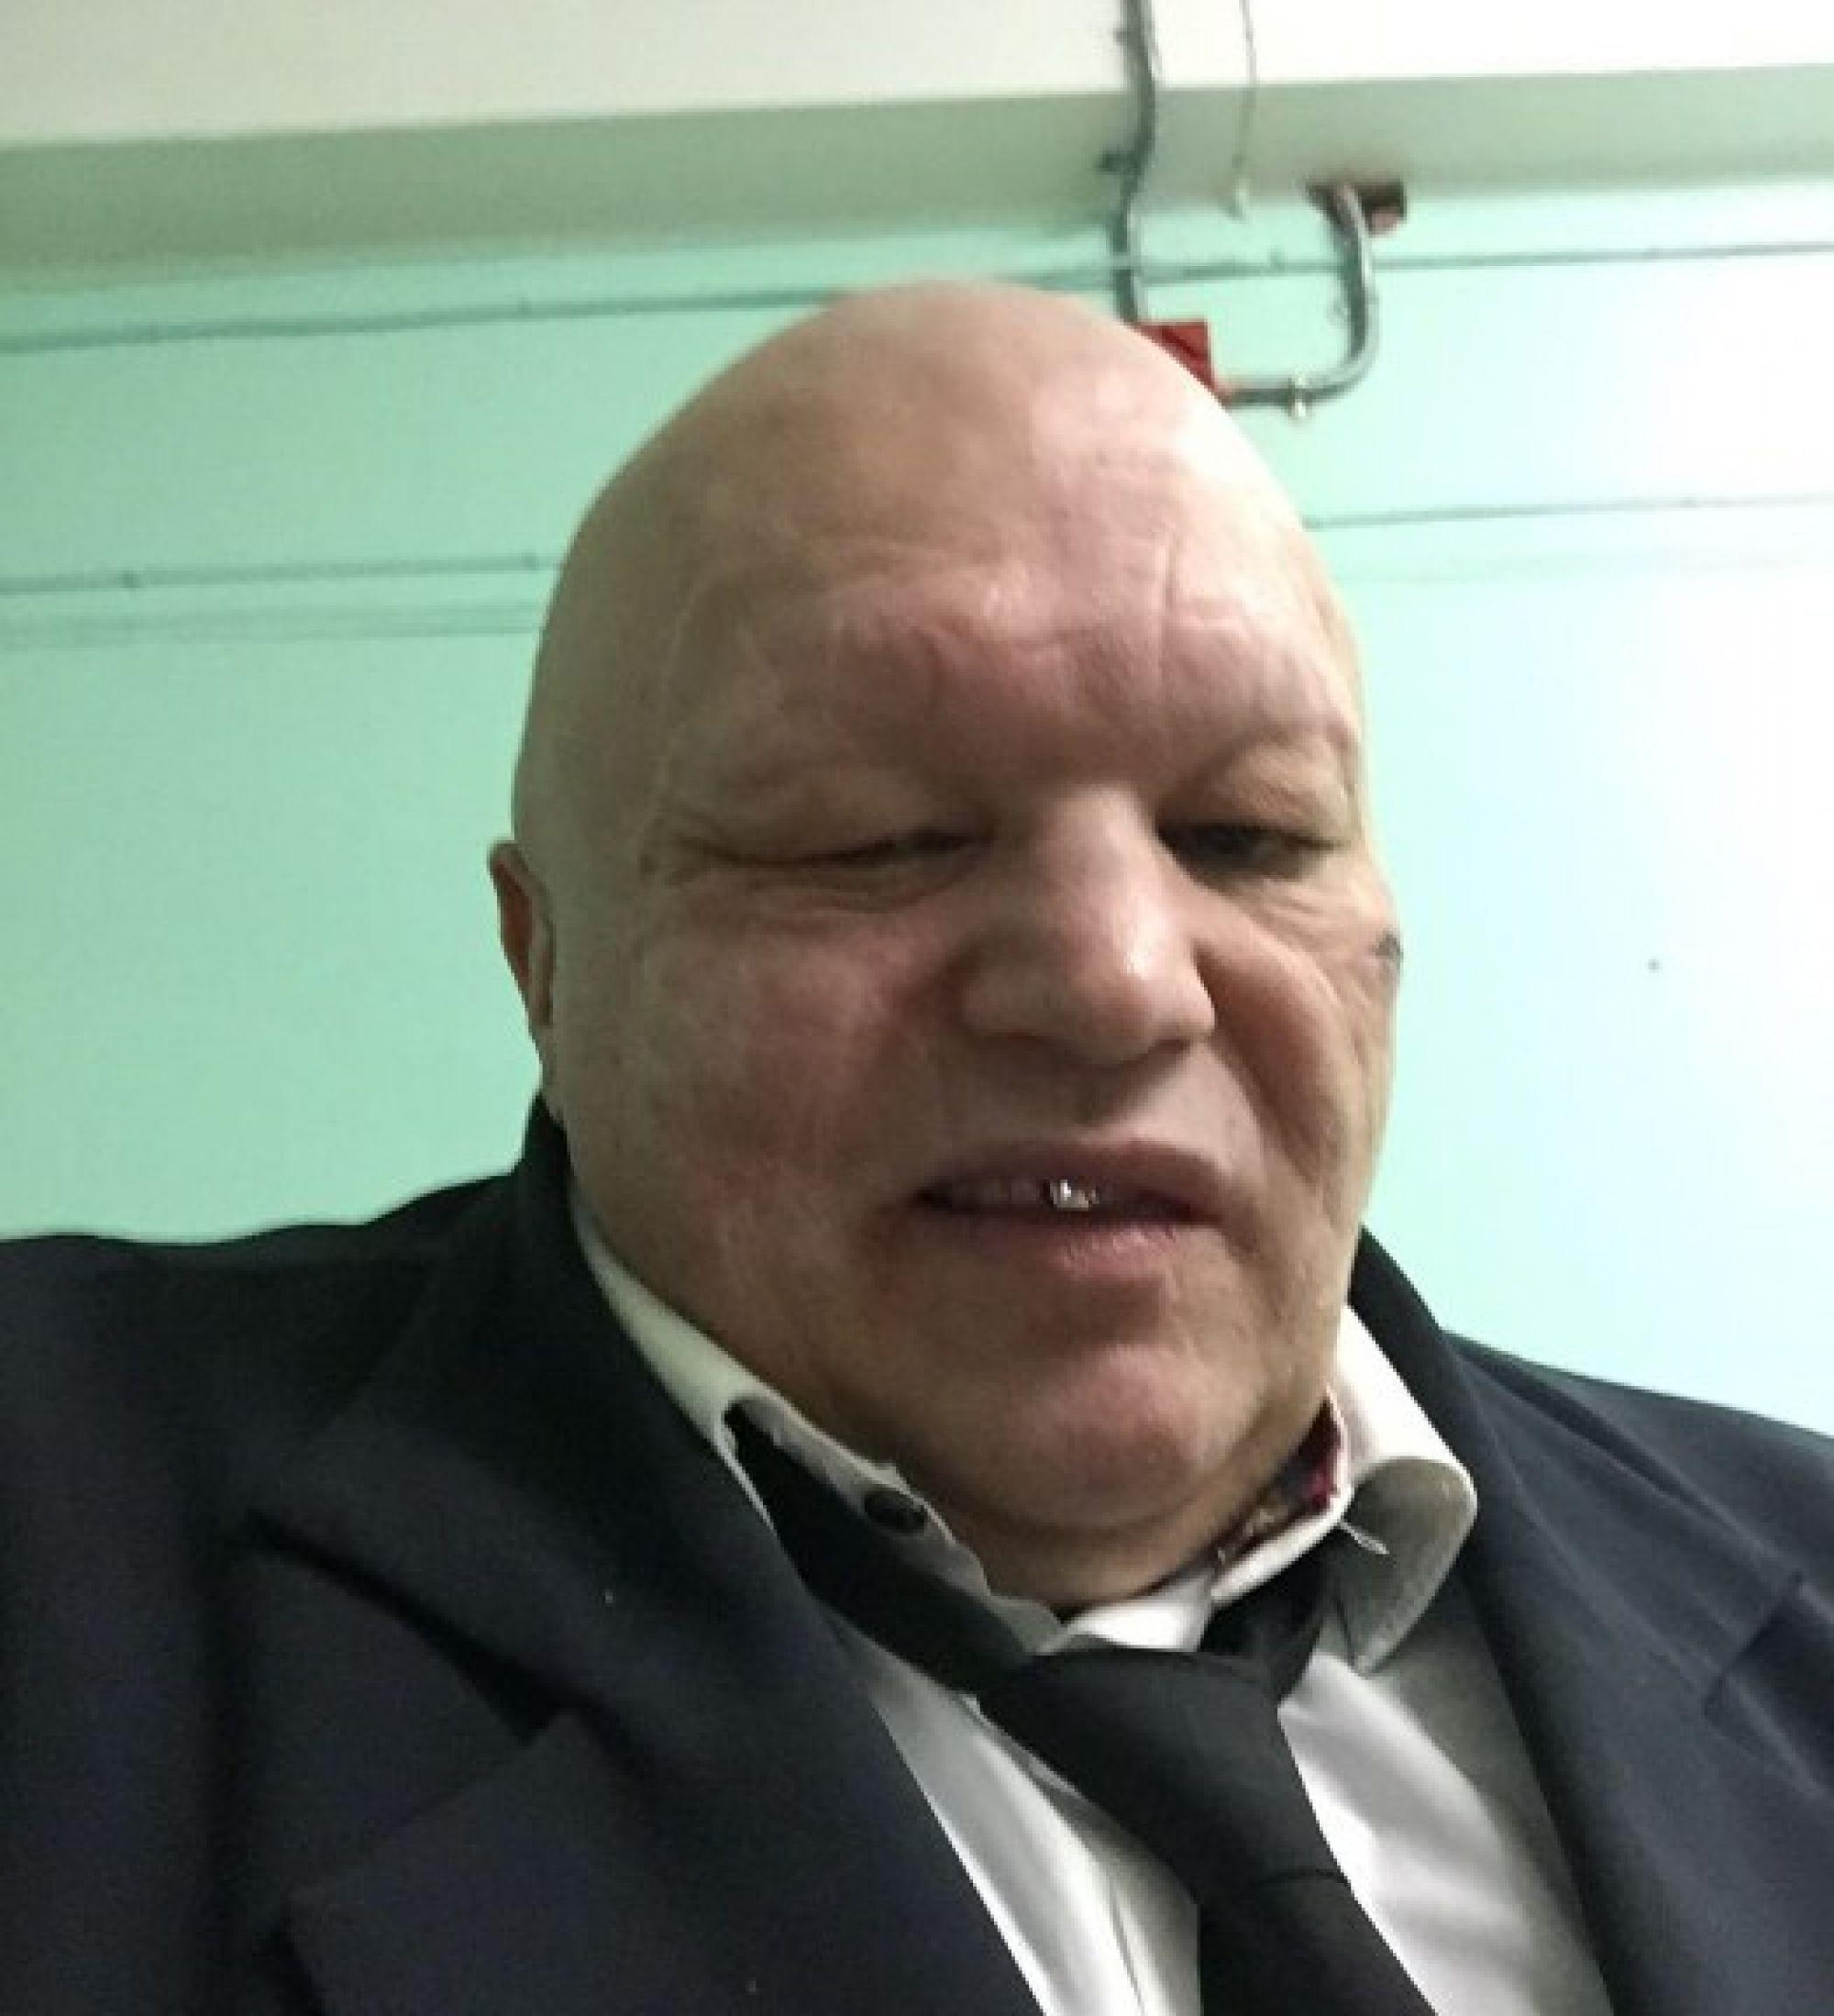 Битва тяжеловесов: Стас Барецкий напал на сына Никаса Сафронова из-за ревности